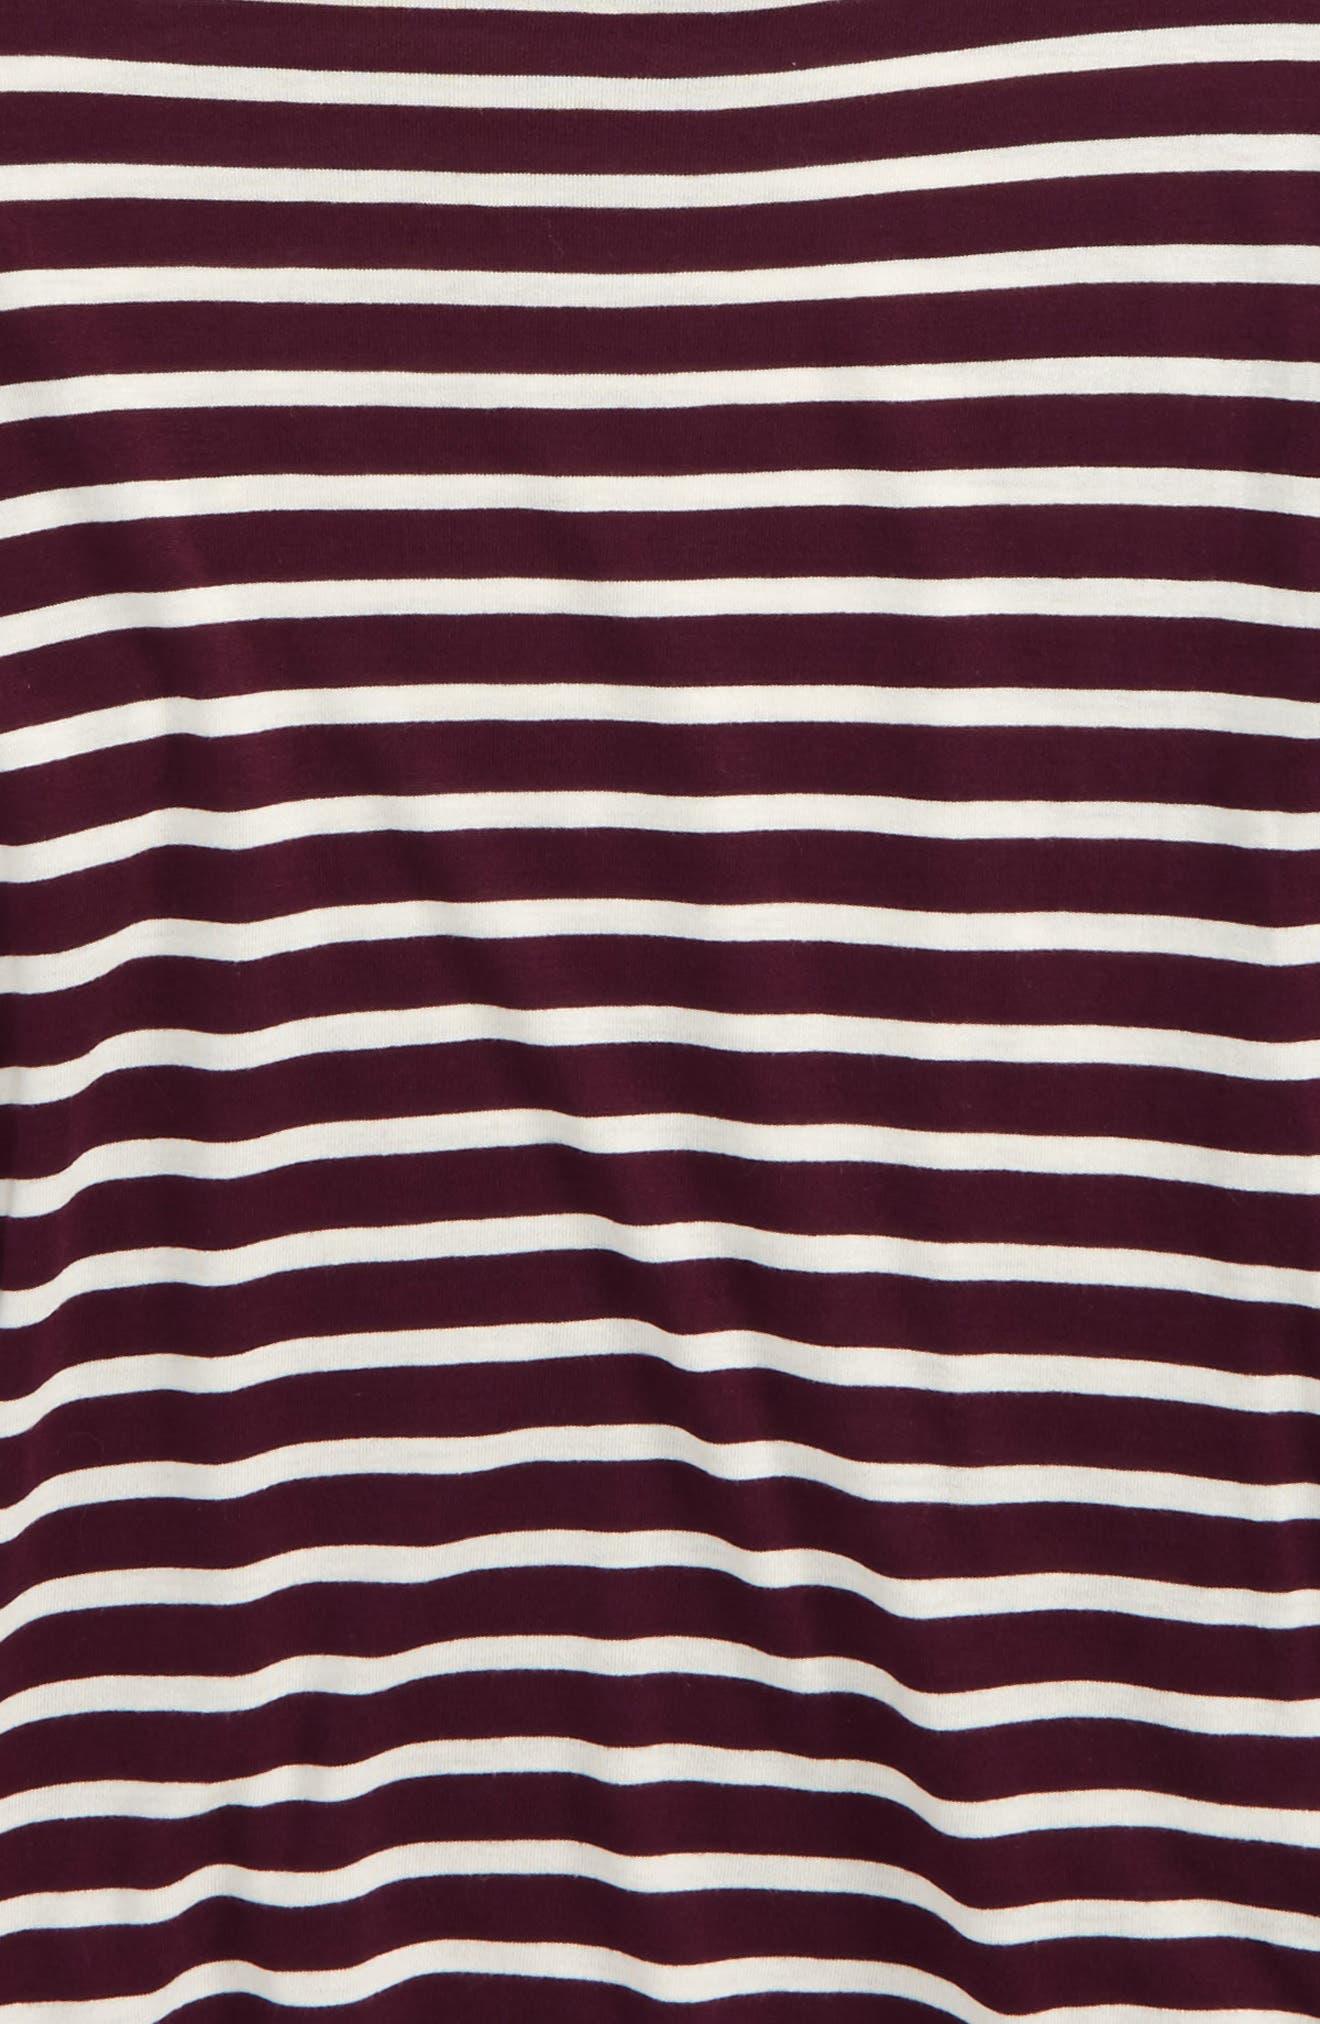 Bell Sleeve Tee,                             Alternate thumbnail 2, color,                             501